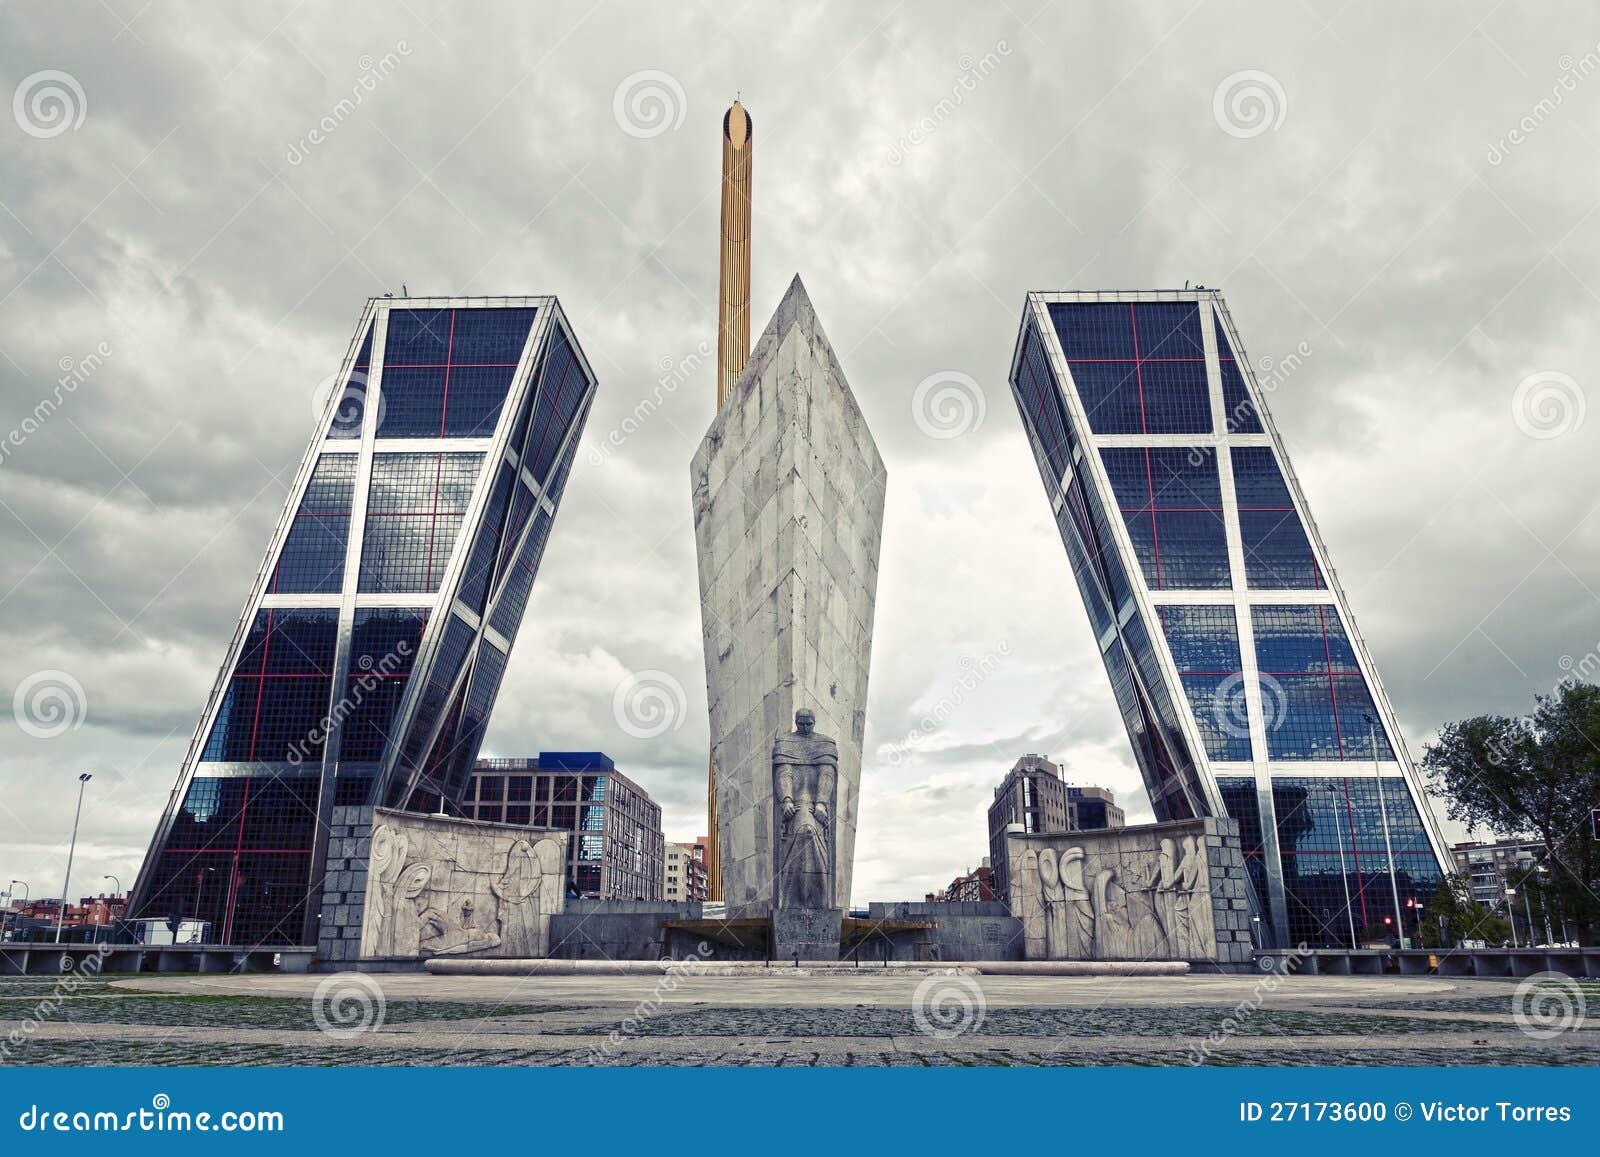 Architettura A Madrid modern architecture in madrid (puerta de europa) stock photo